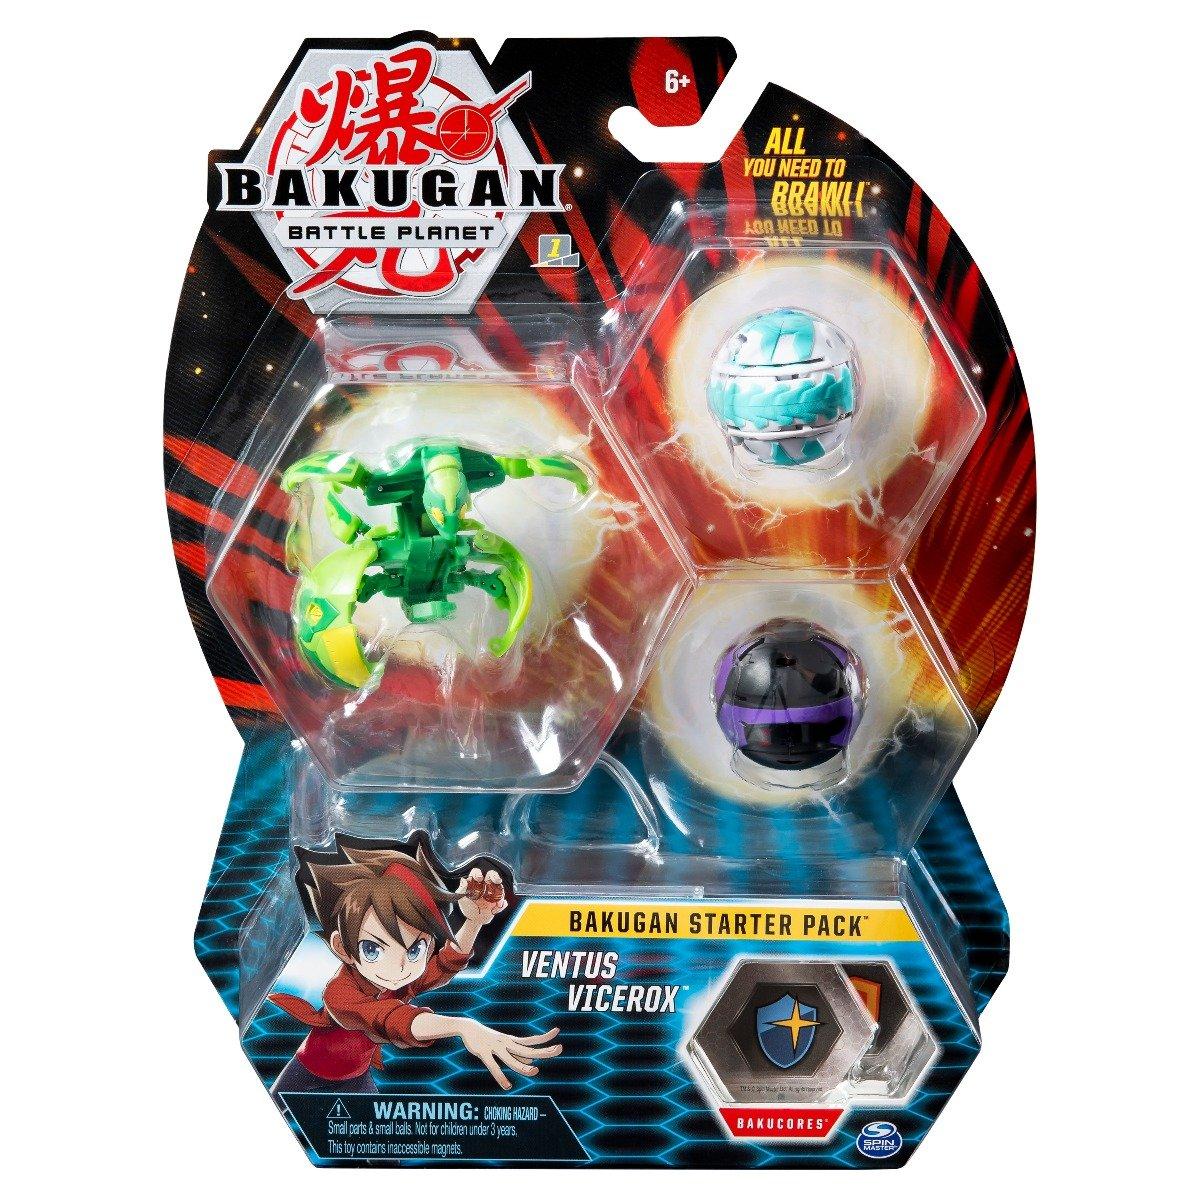 Set Bakugan Battle Planet Starter Ventus Vicerox, 20114996